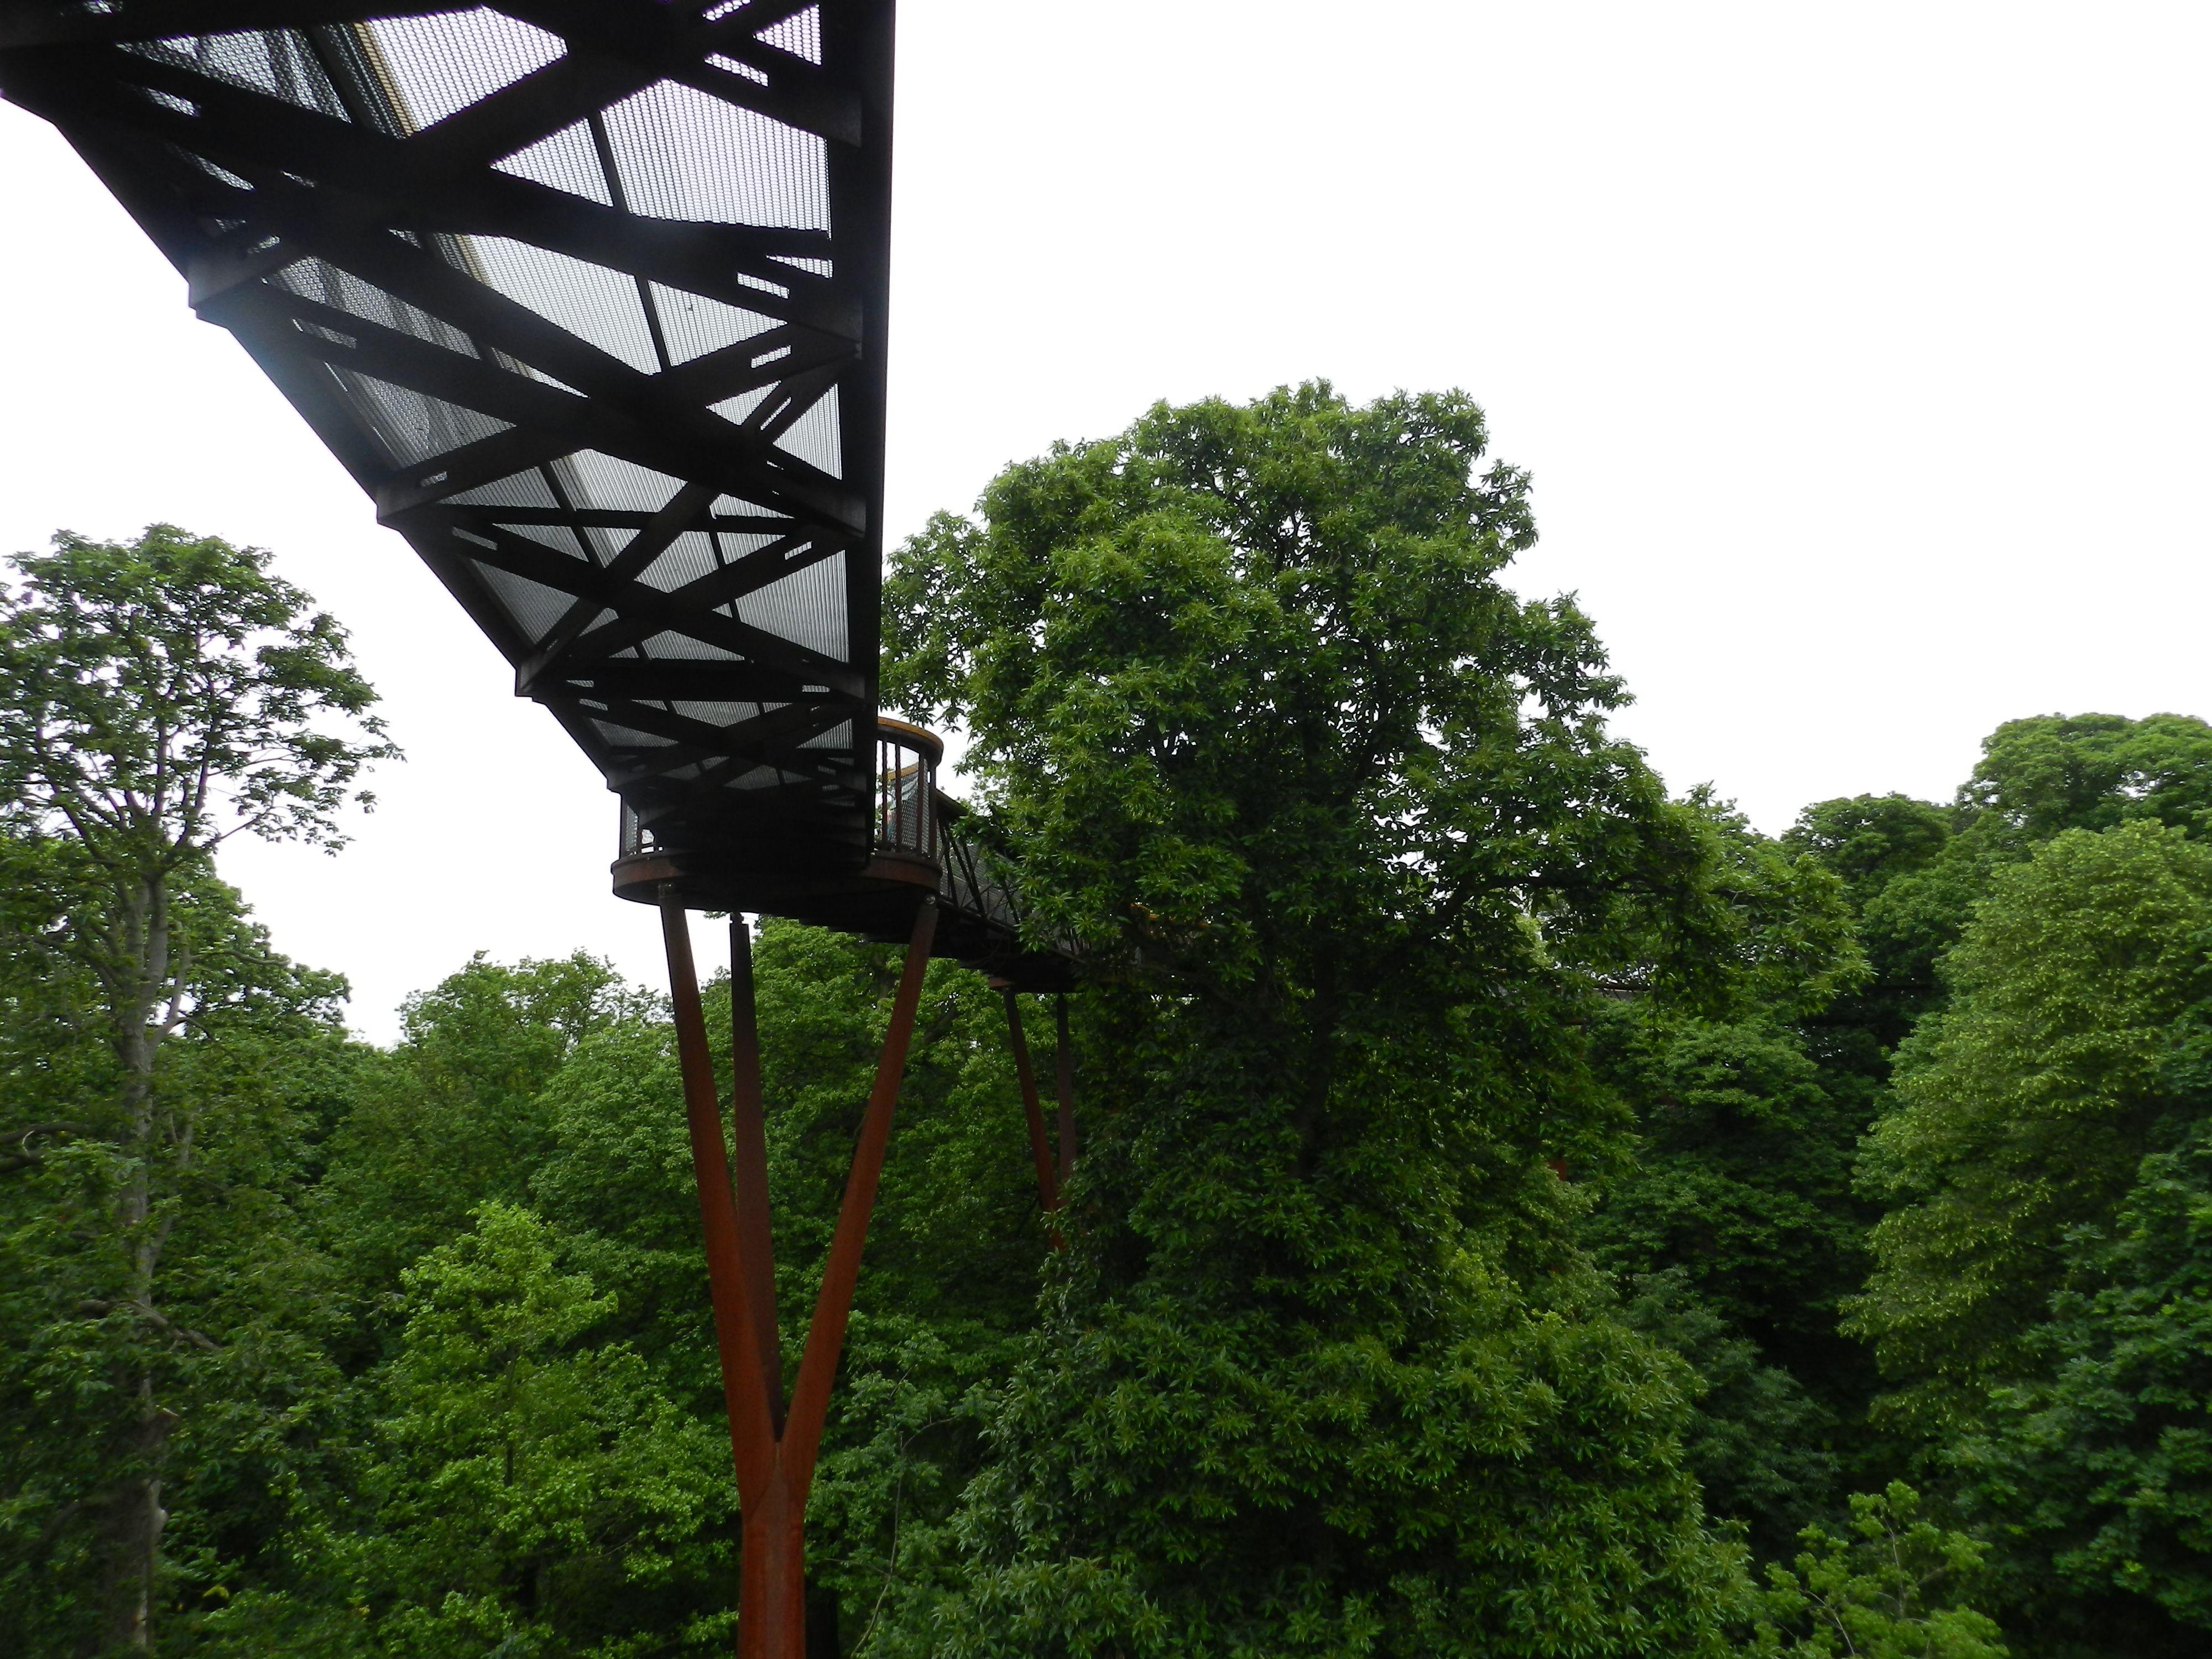 c03907799a6bb369066a36d591654b39 - How High Is The Tree Top Walk At Kew Gardens